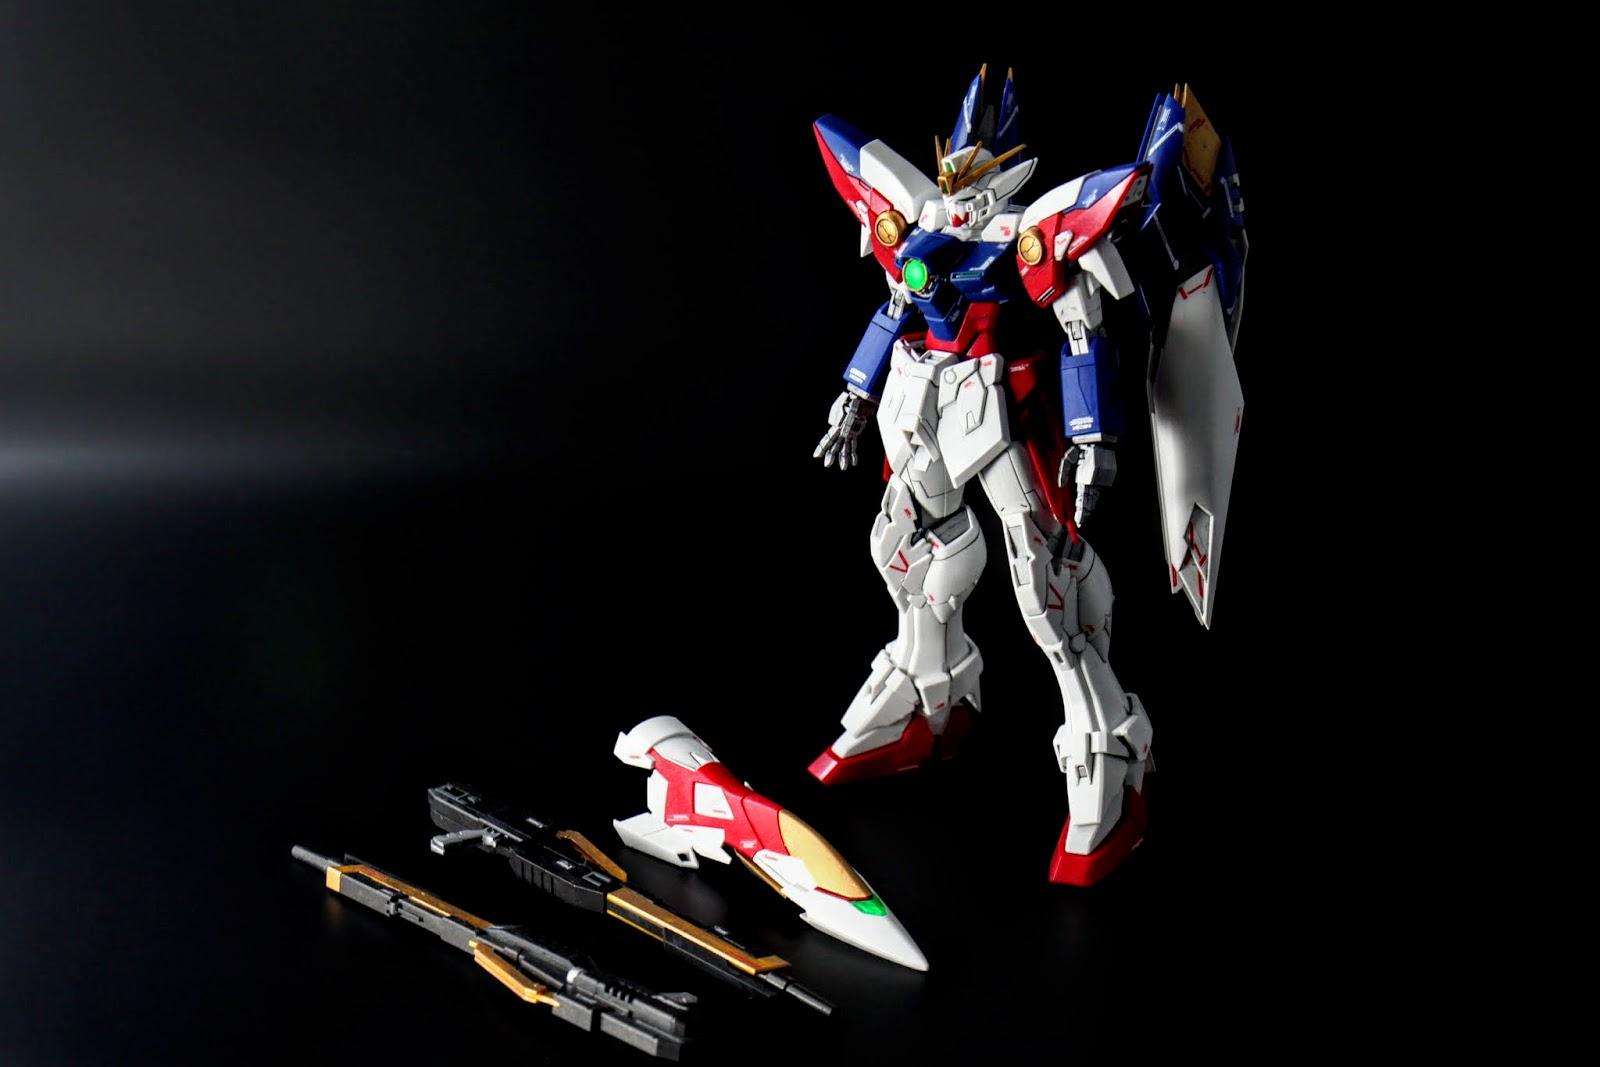 Wing Gundam Proto Zero;吃書設定再一發,TV版的Wing Gundam Zero 造型大改後變成原型機